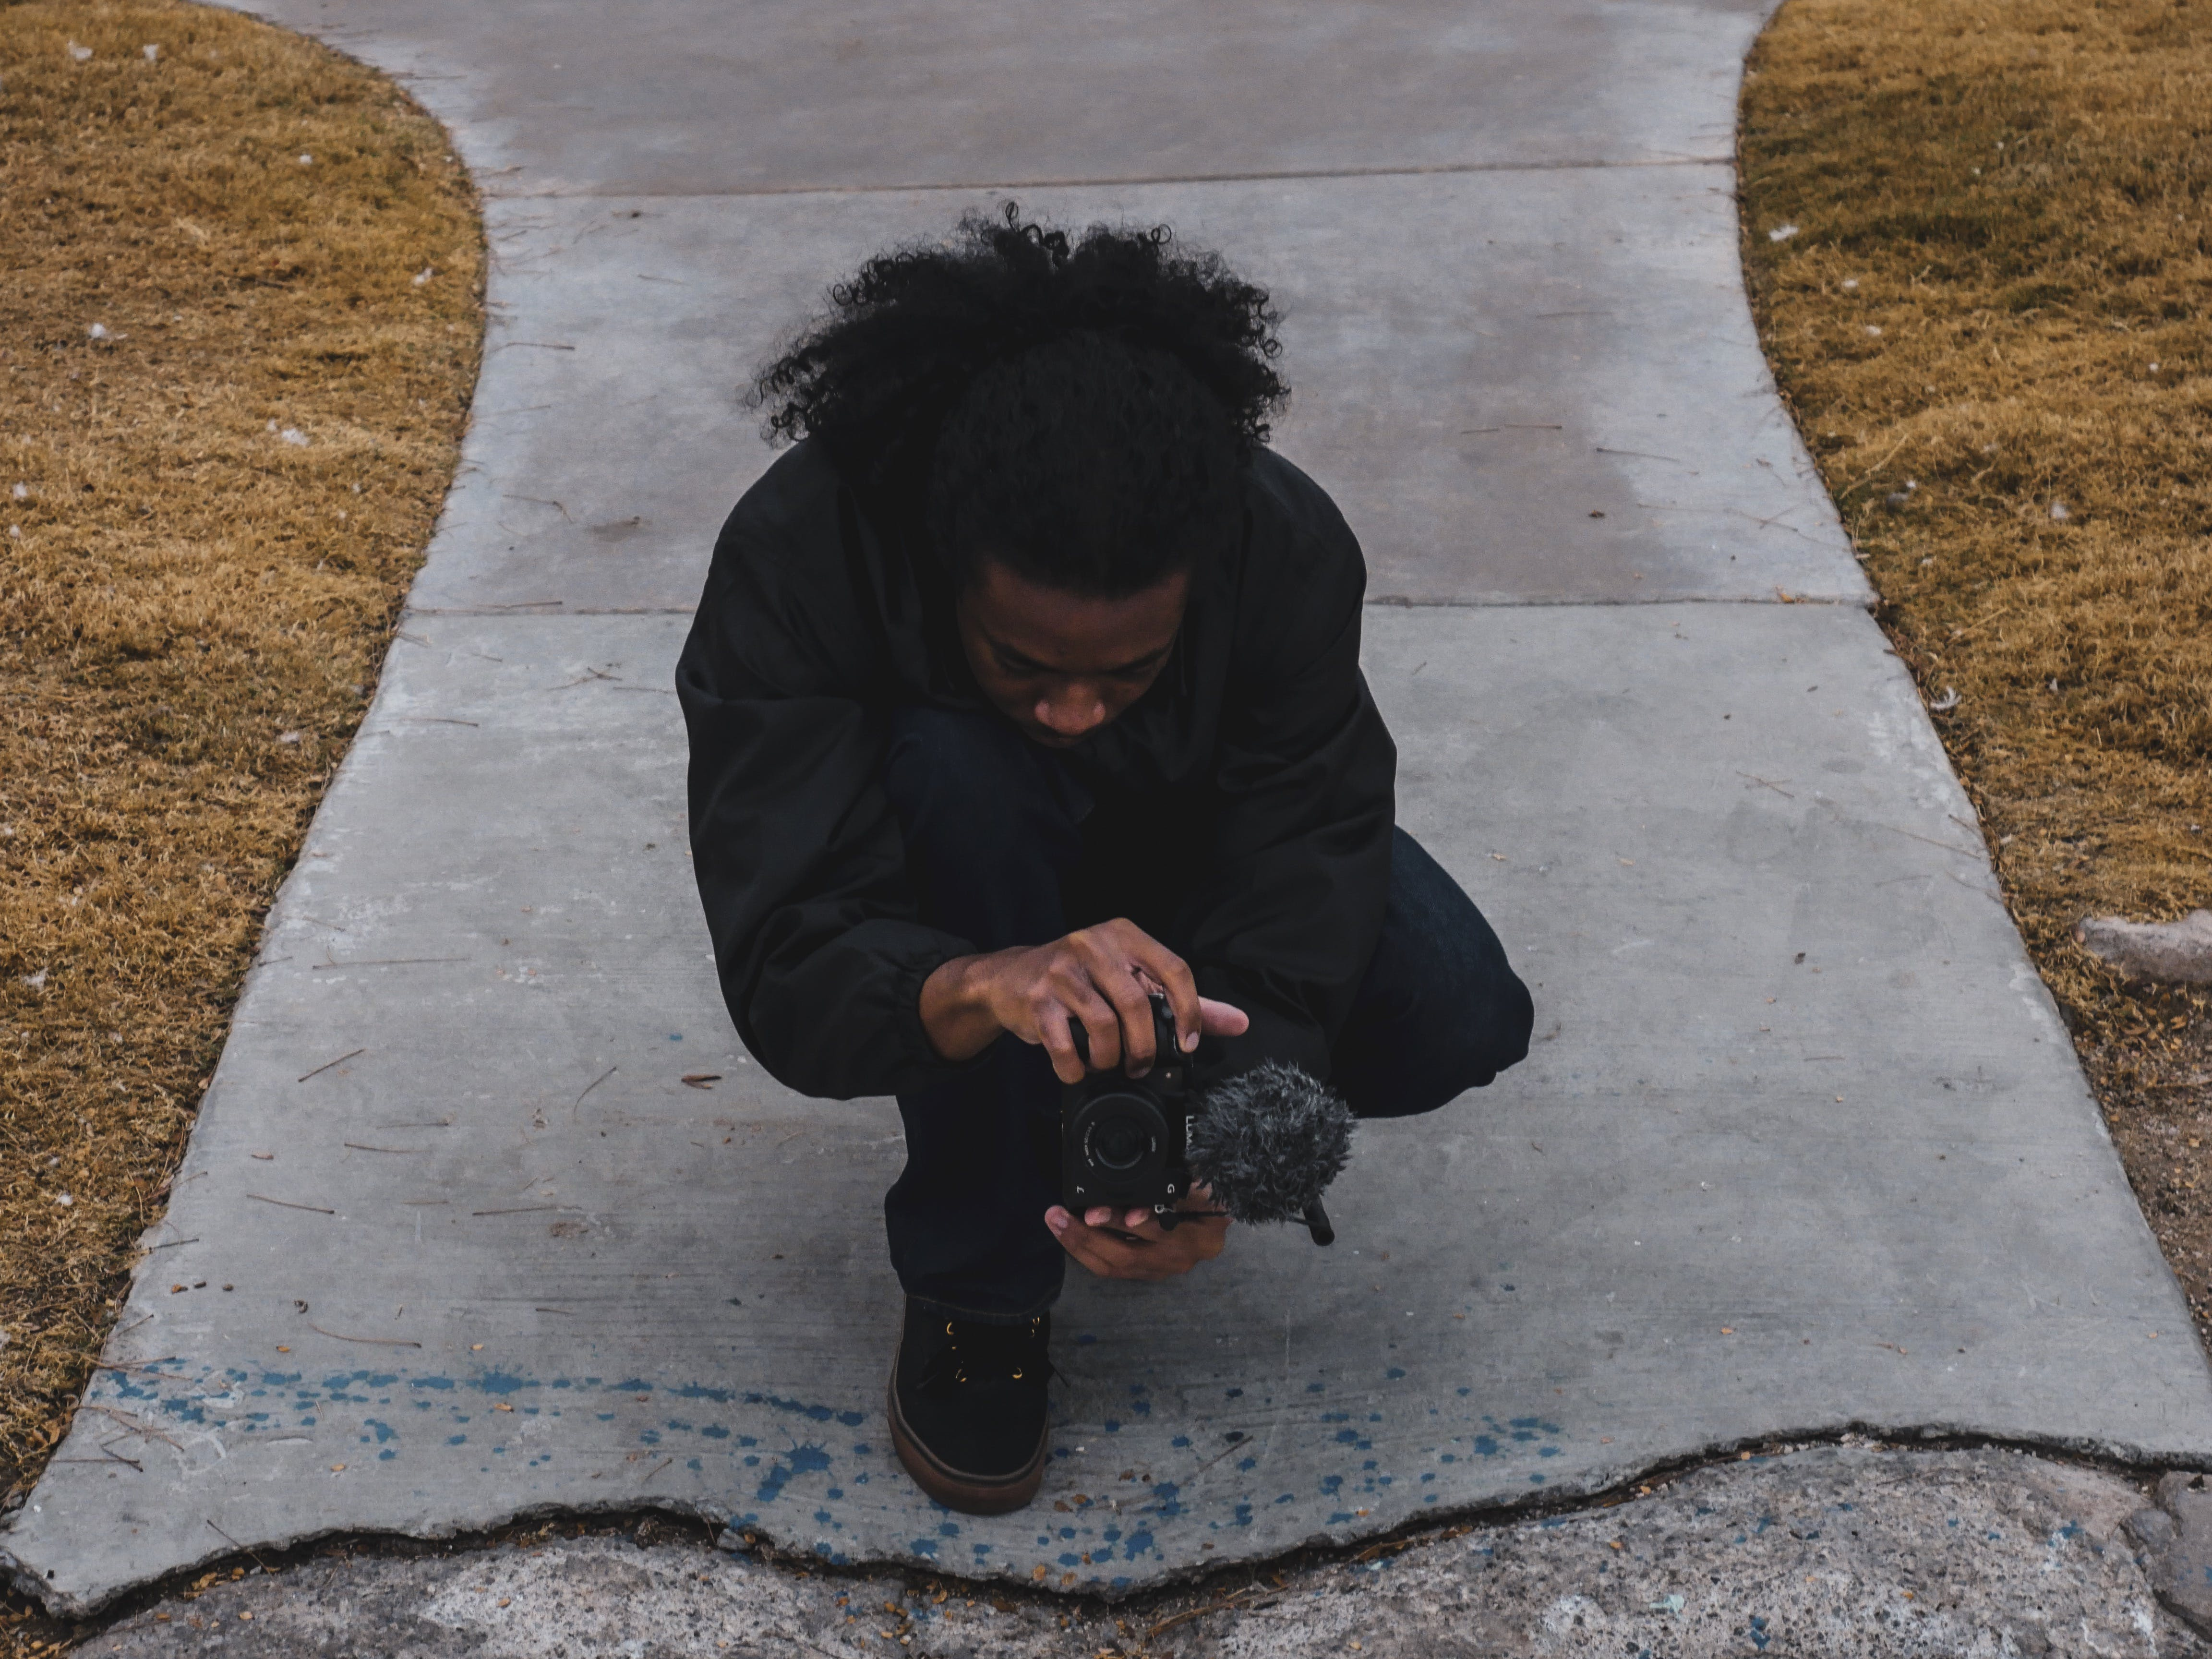 Man Crouching Holding Camera